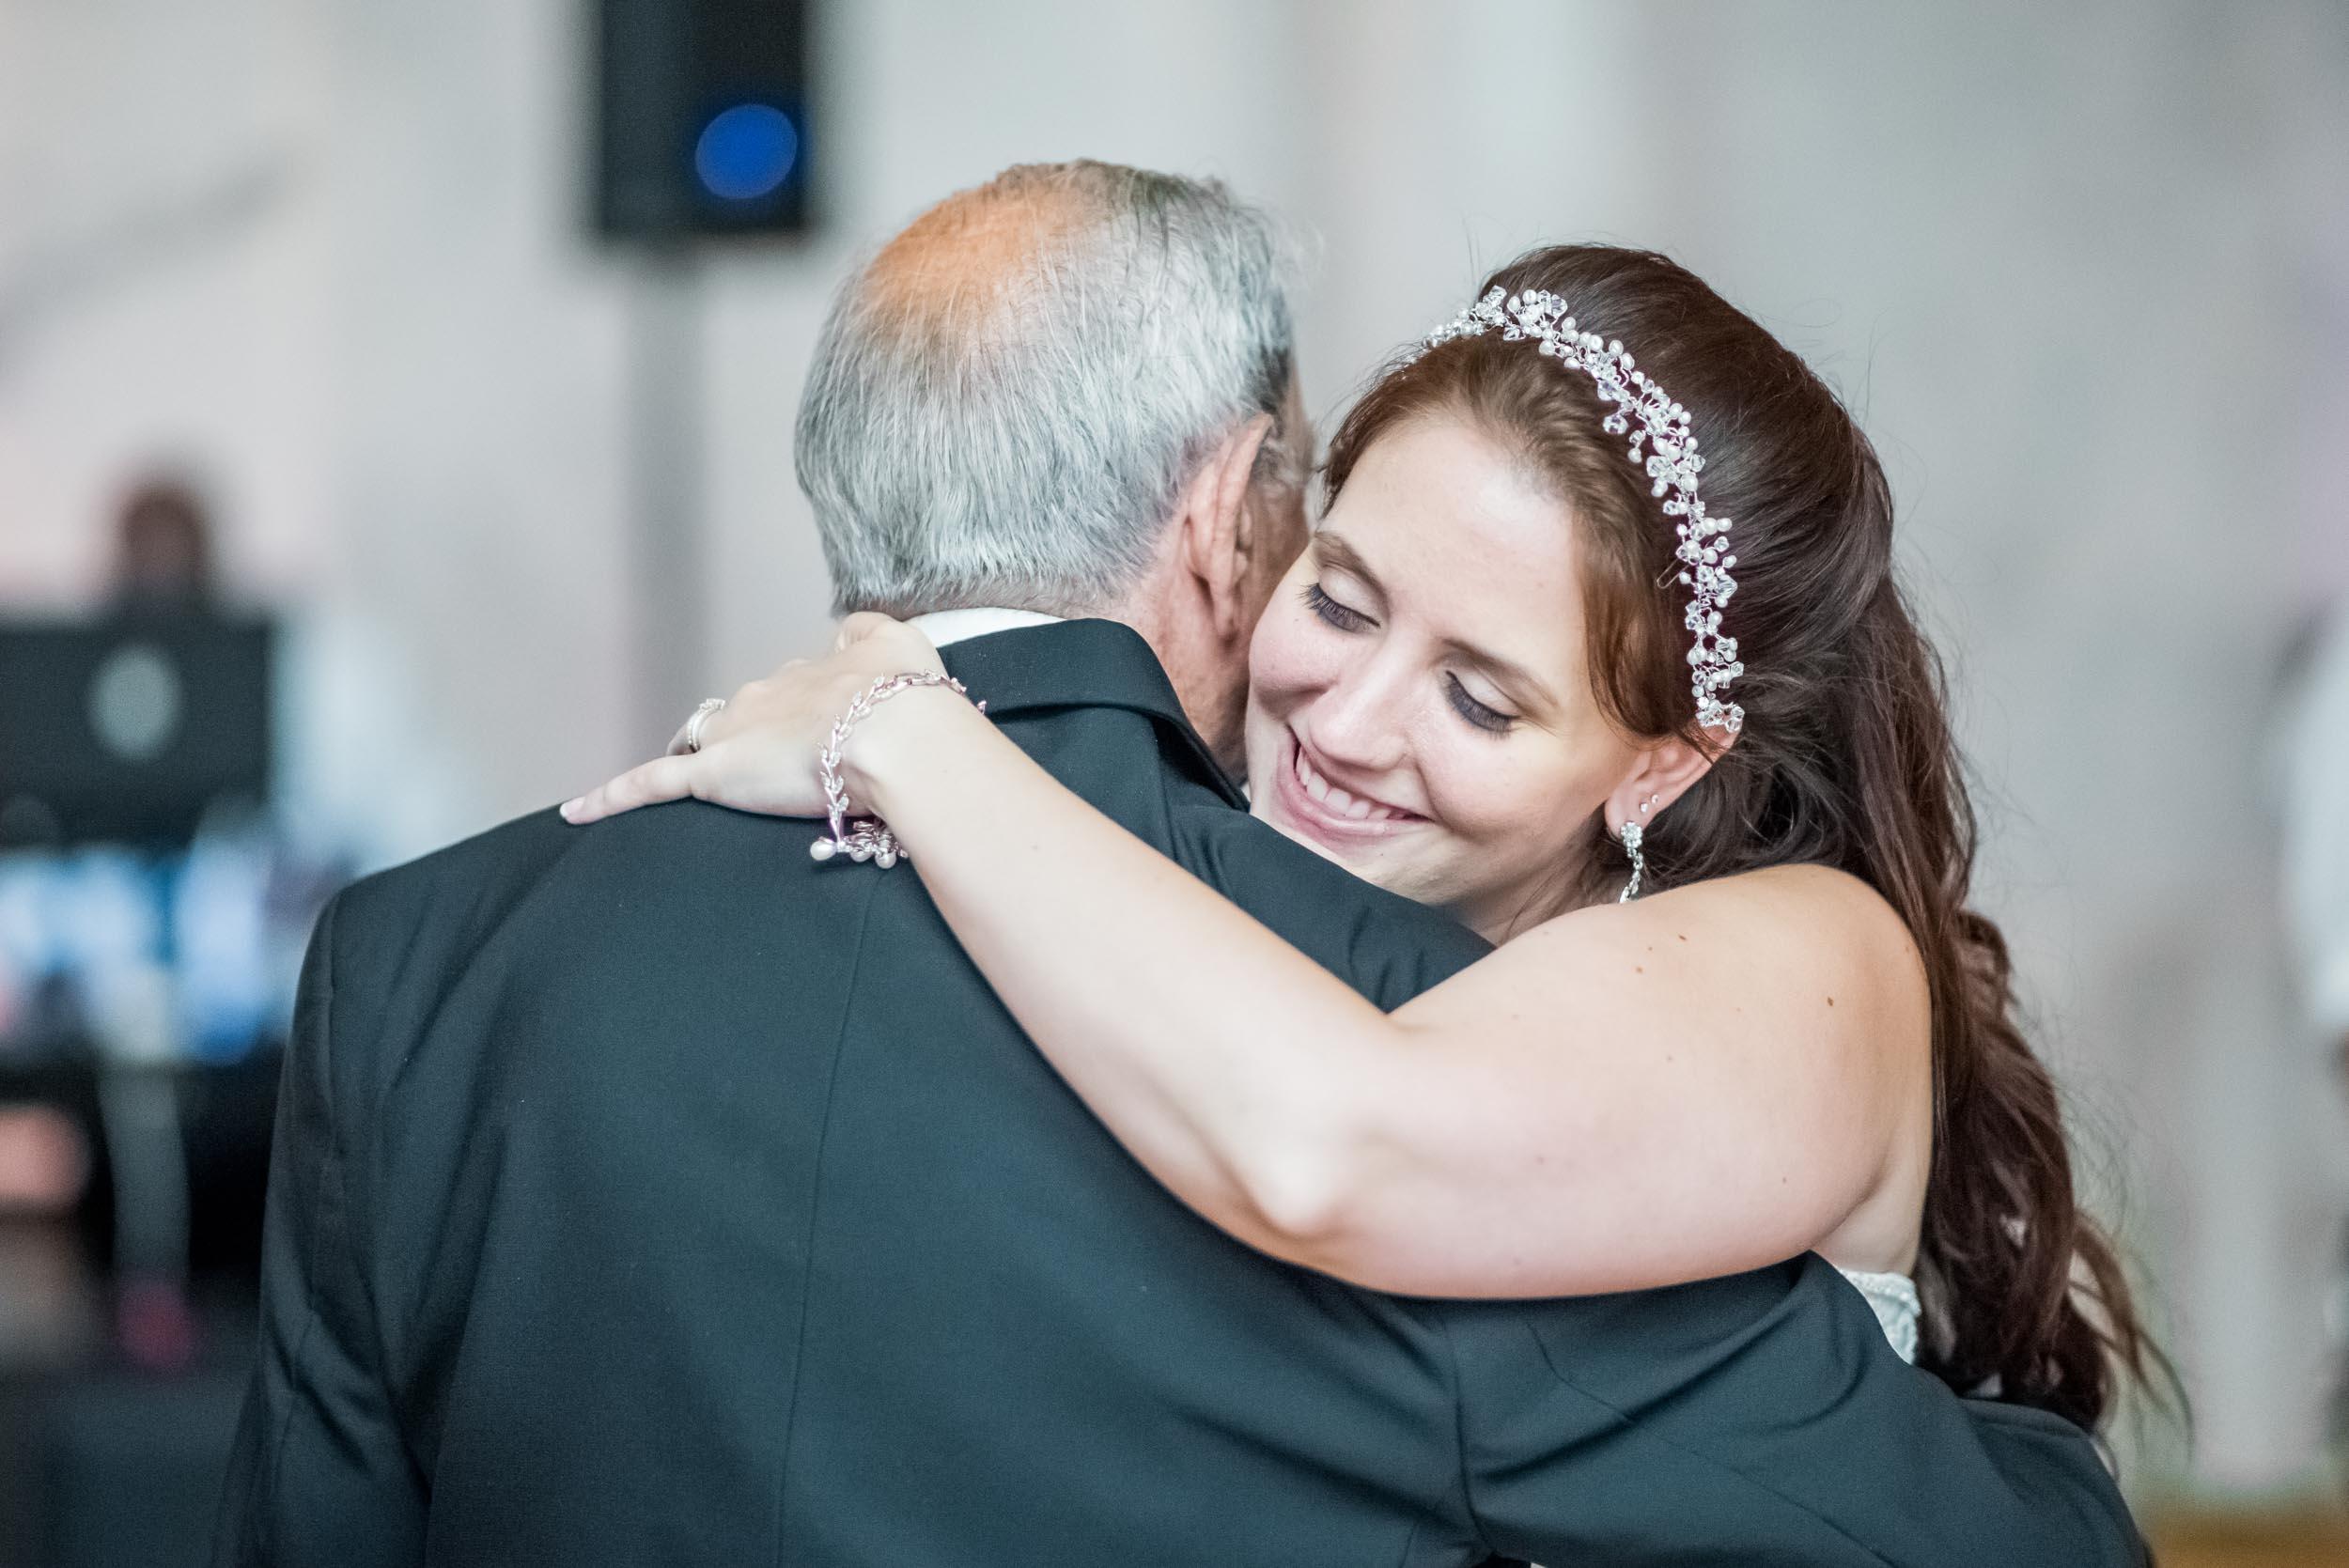 dc+metro+wedding+photographer+vadym+guliuk+photography+wedding+parent+dances-2023.jpg